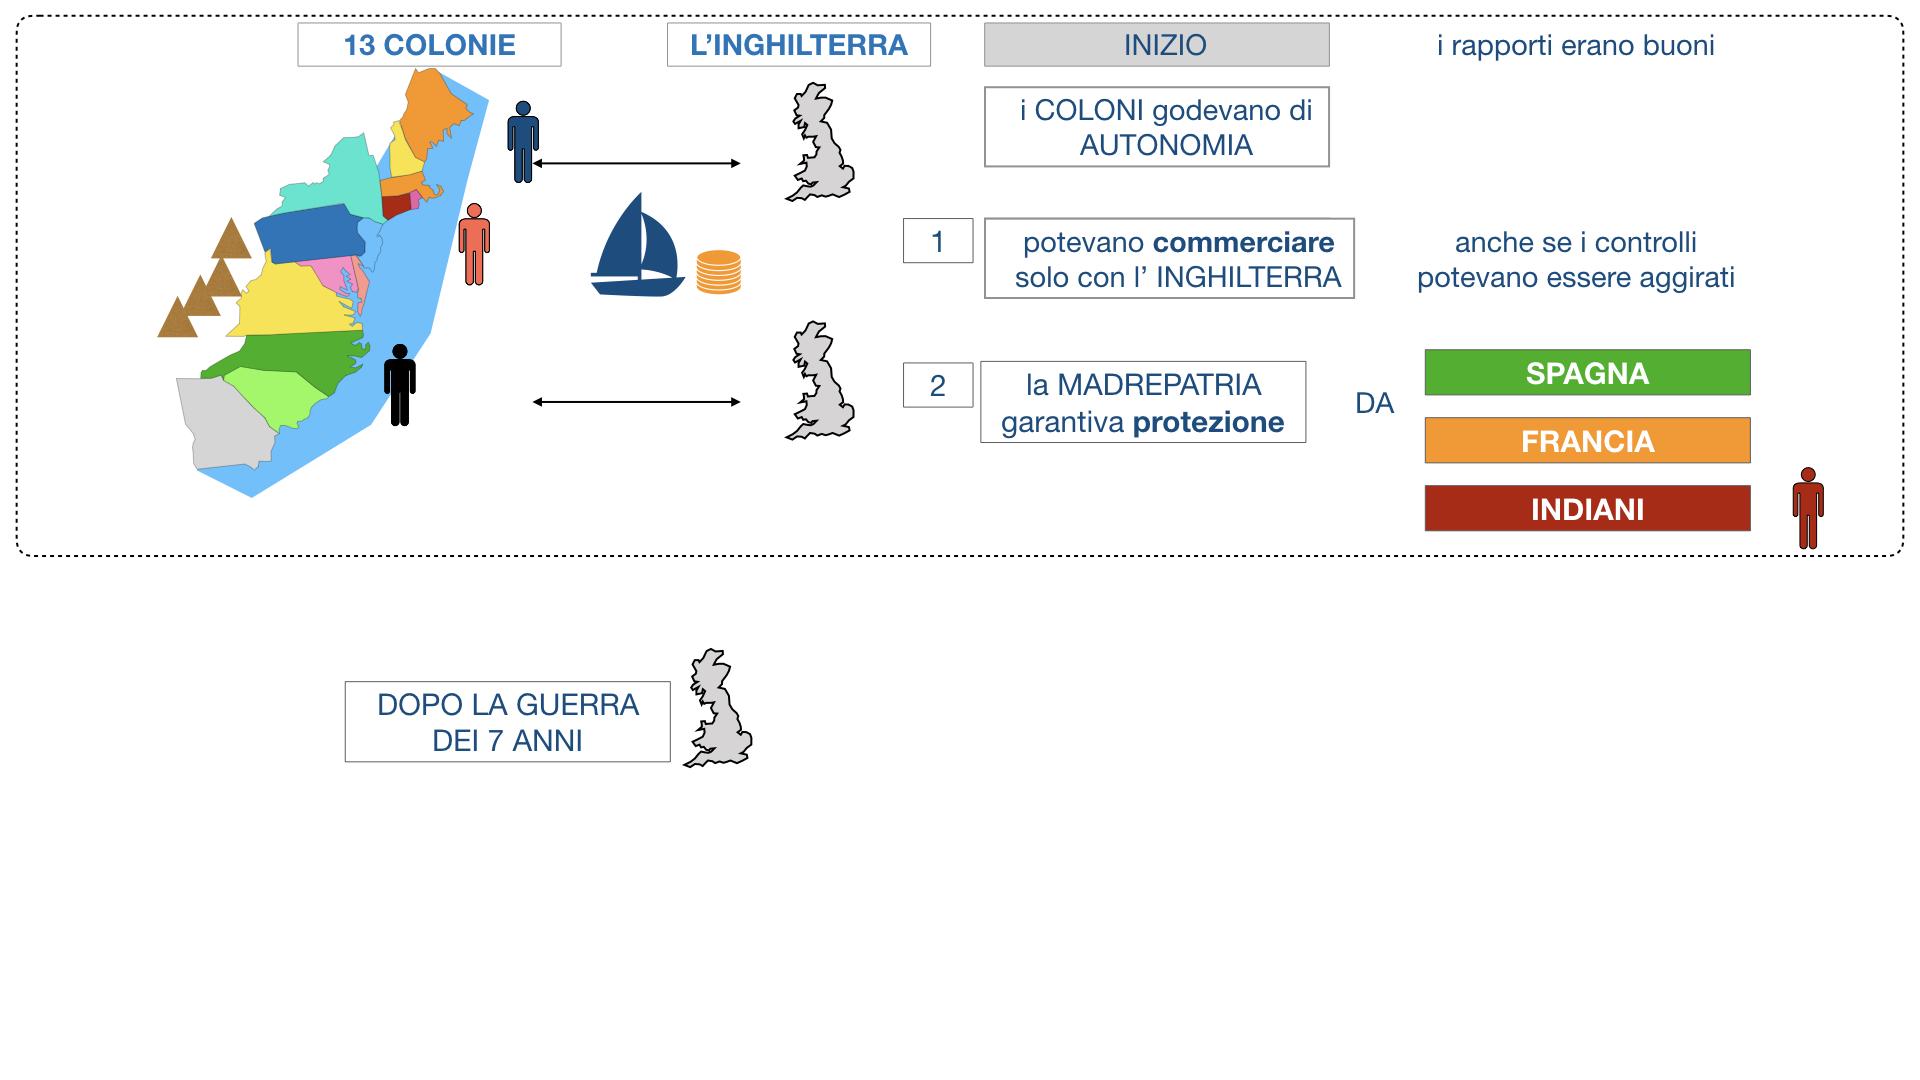 GUERRA DI INDIPENDENZA AMERICANA_SIMULAZIONE.017